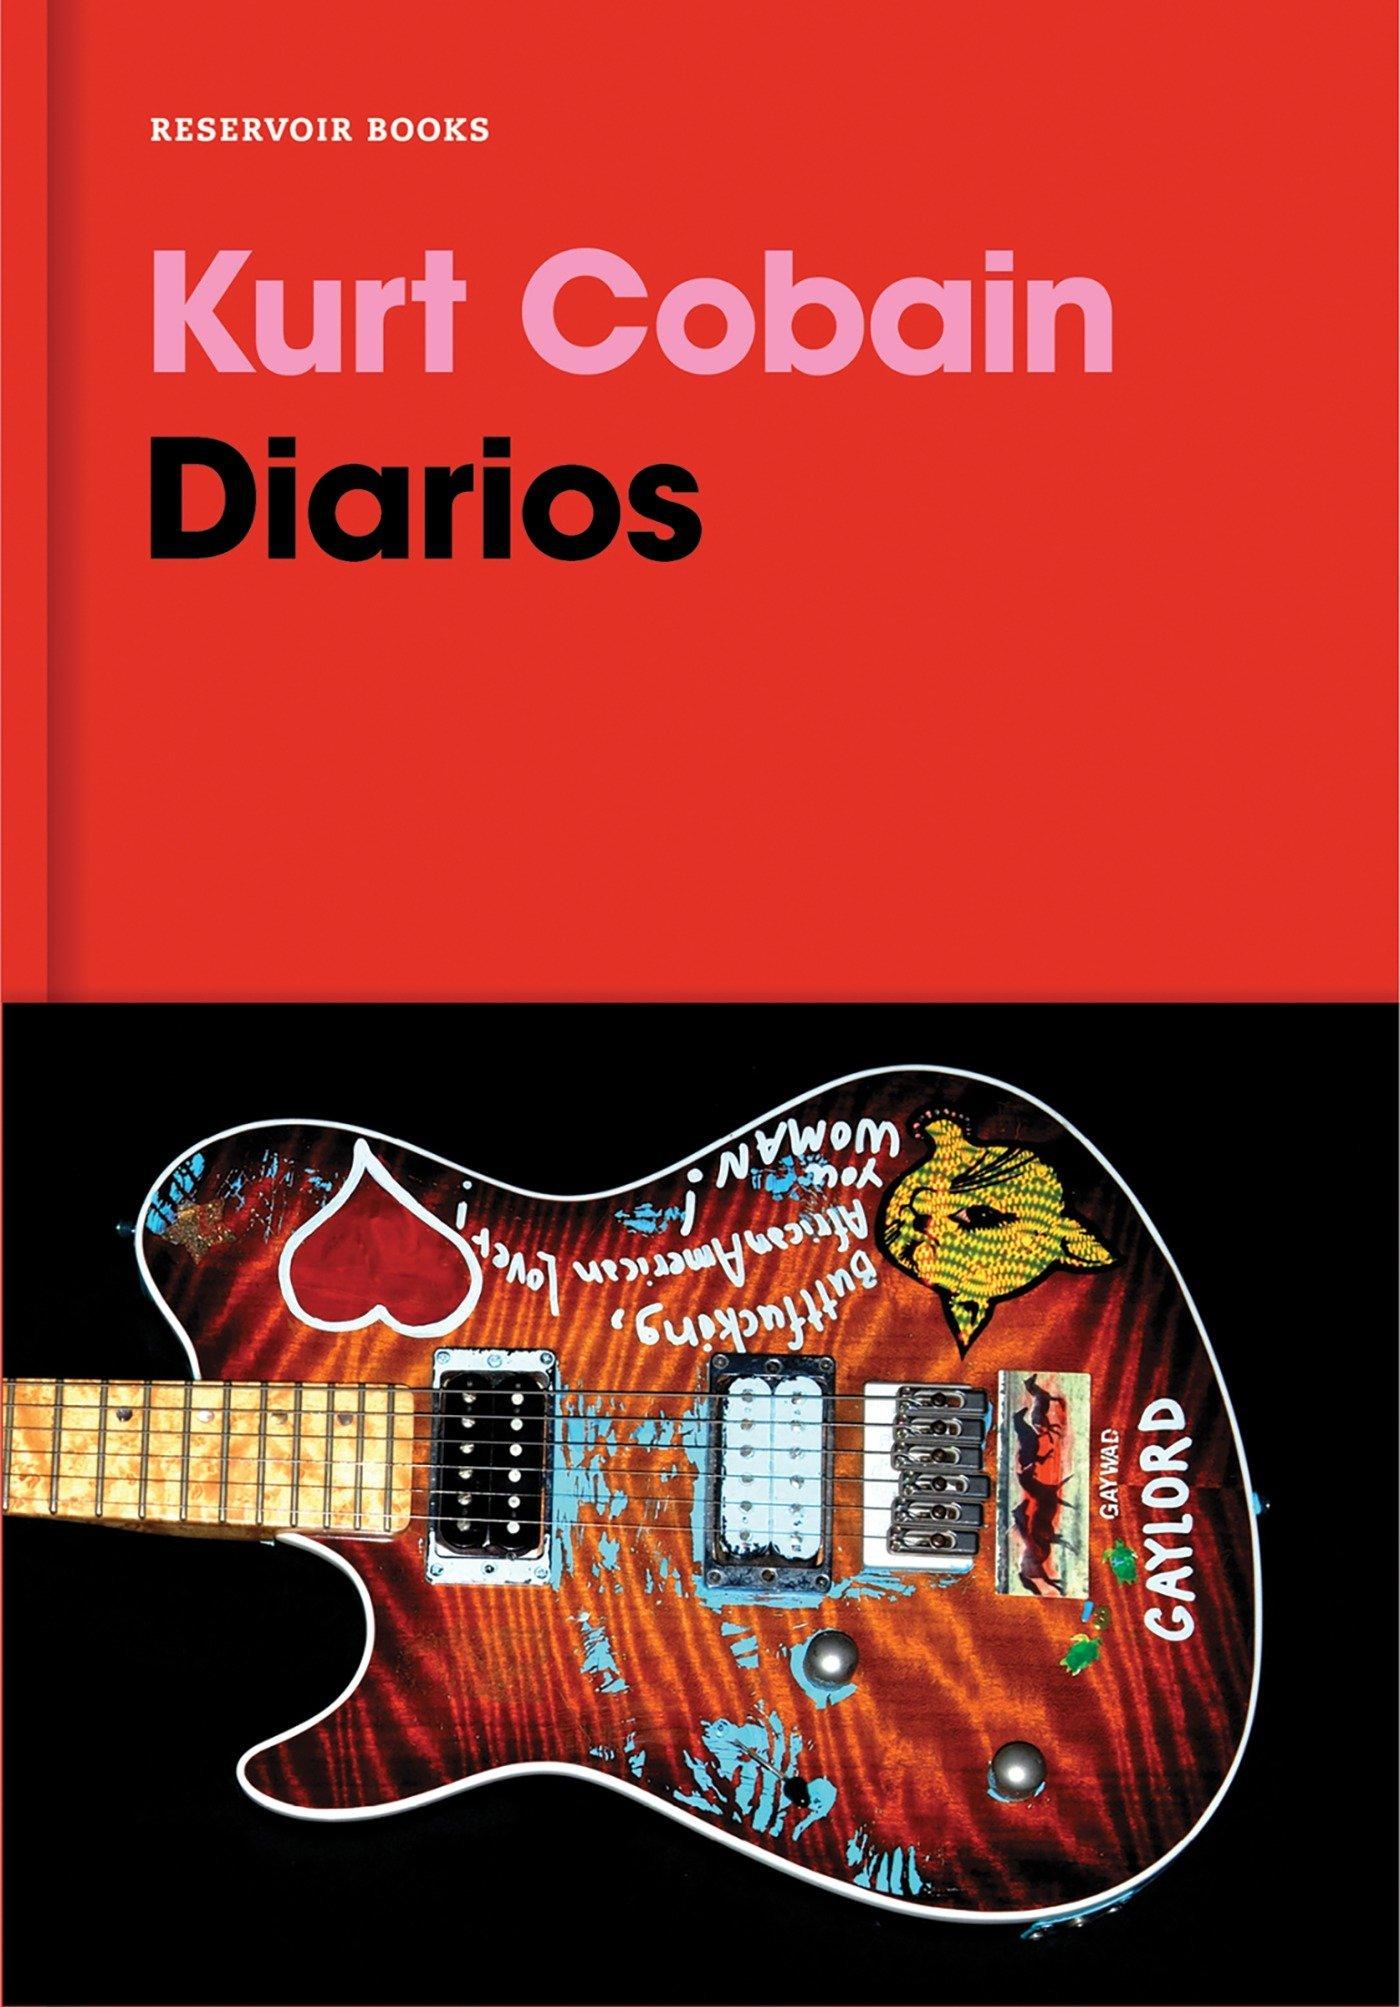 Diarios (RESERVOIR NARRATIVA) Tapa dura – 10 nov 2016 Kurt Cobain ANGELES; LEIVA MORALES RESERVOIR BOOKS 8416709203